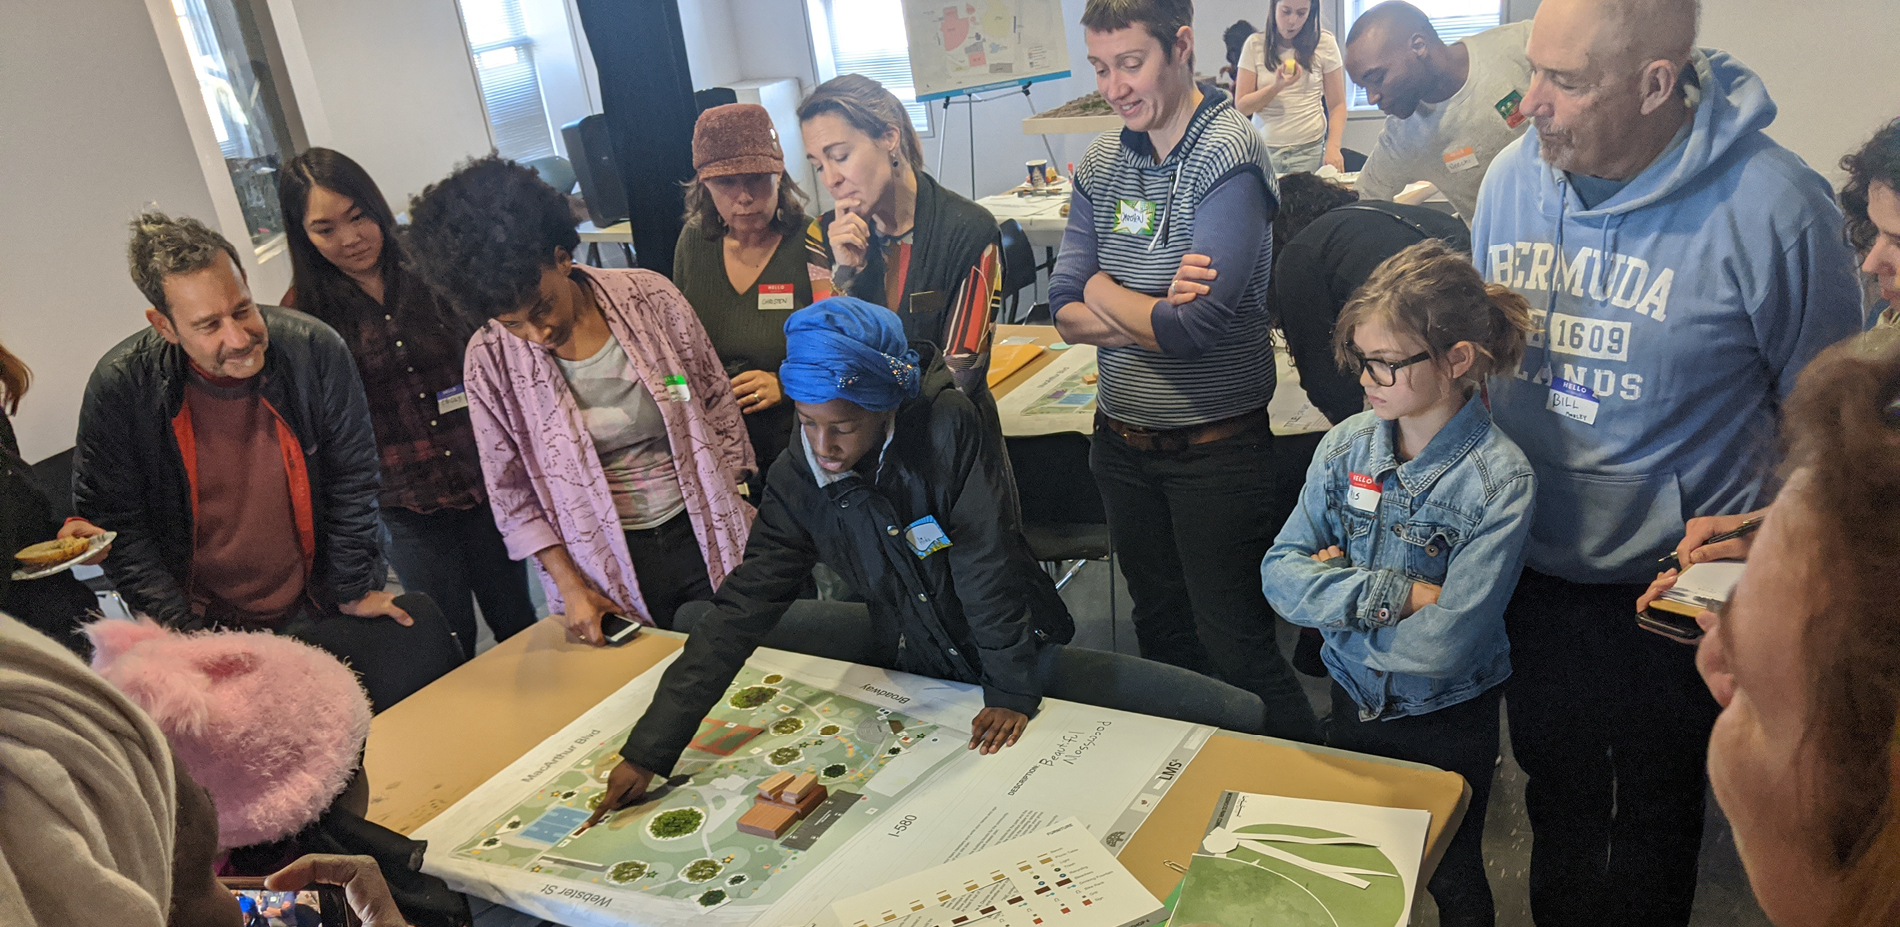 Presenting Designs in Community